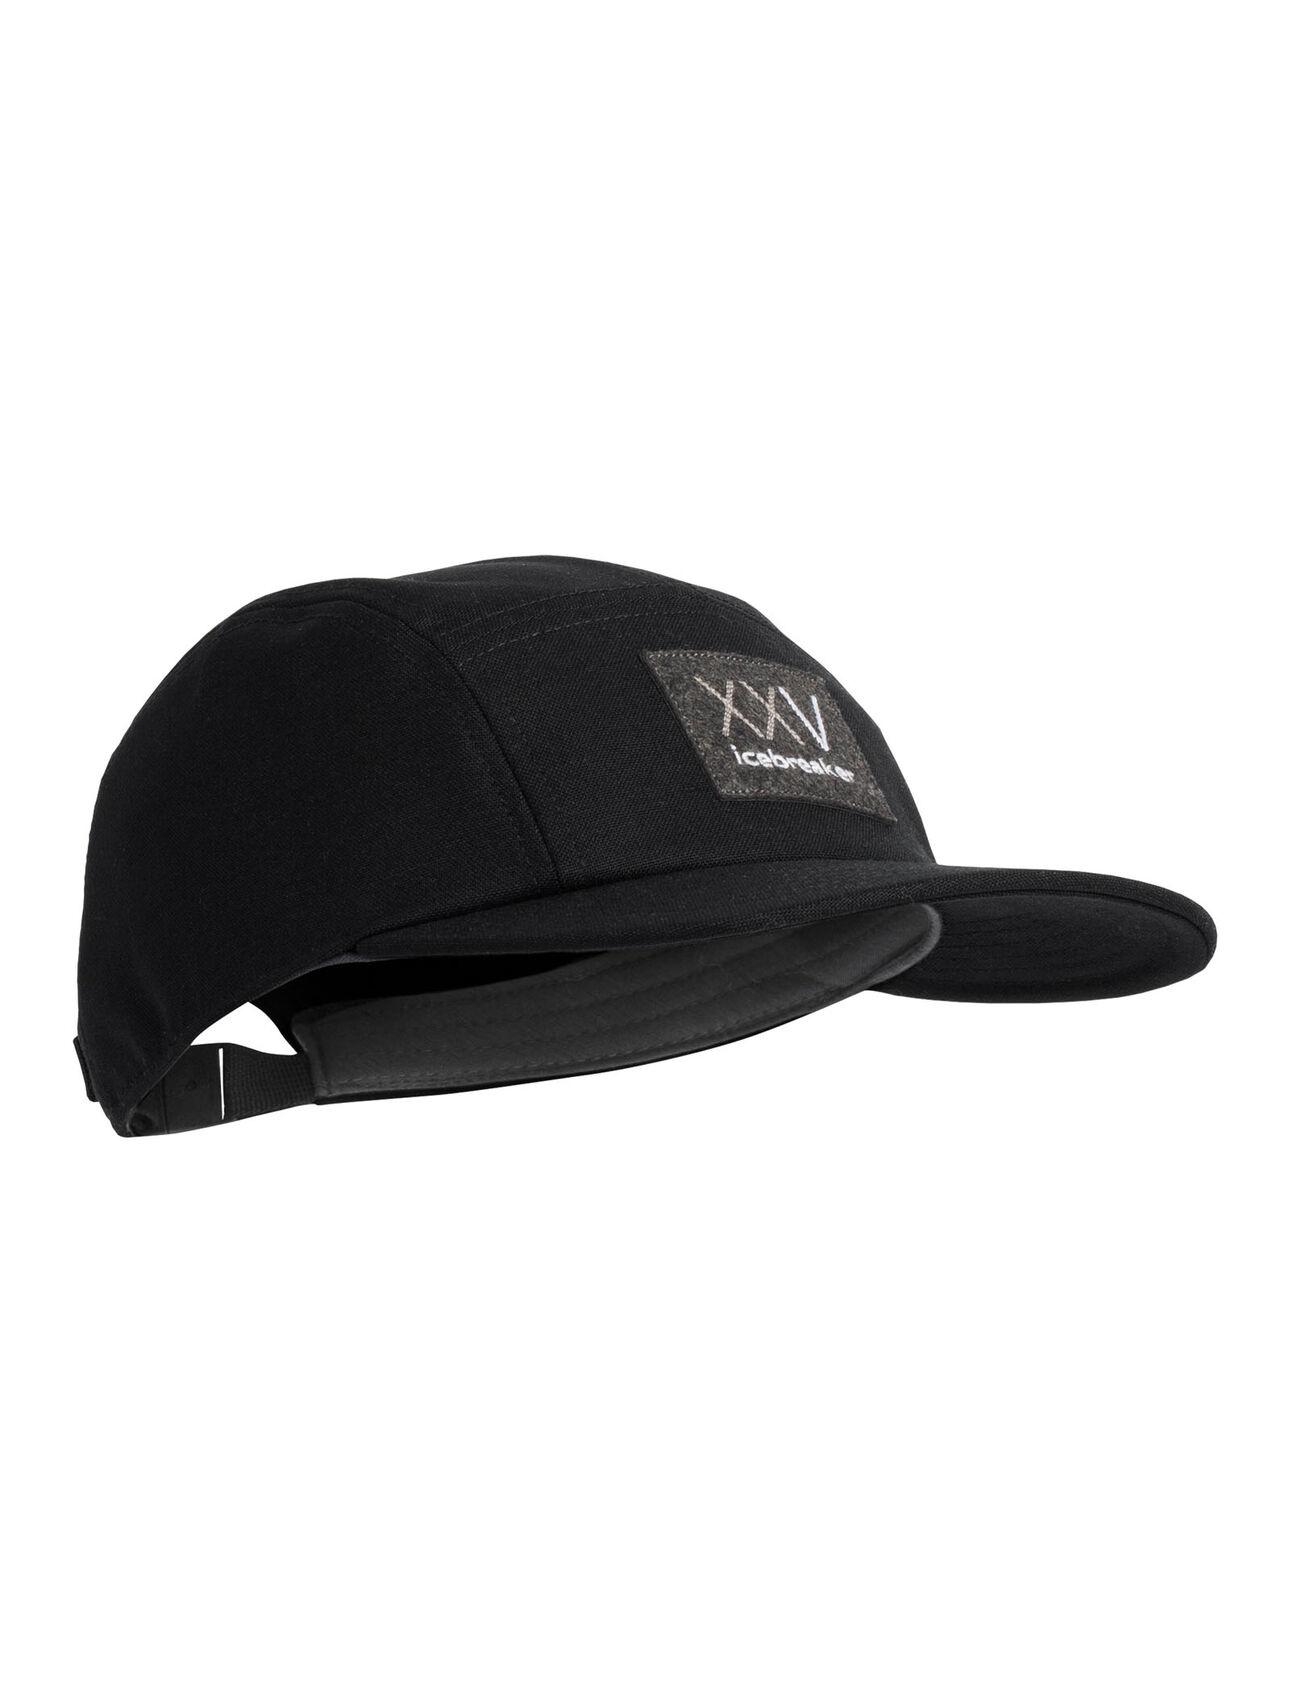 Icebreaker Unisex Icebreaker Anniversary Hat